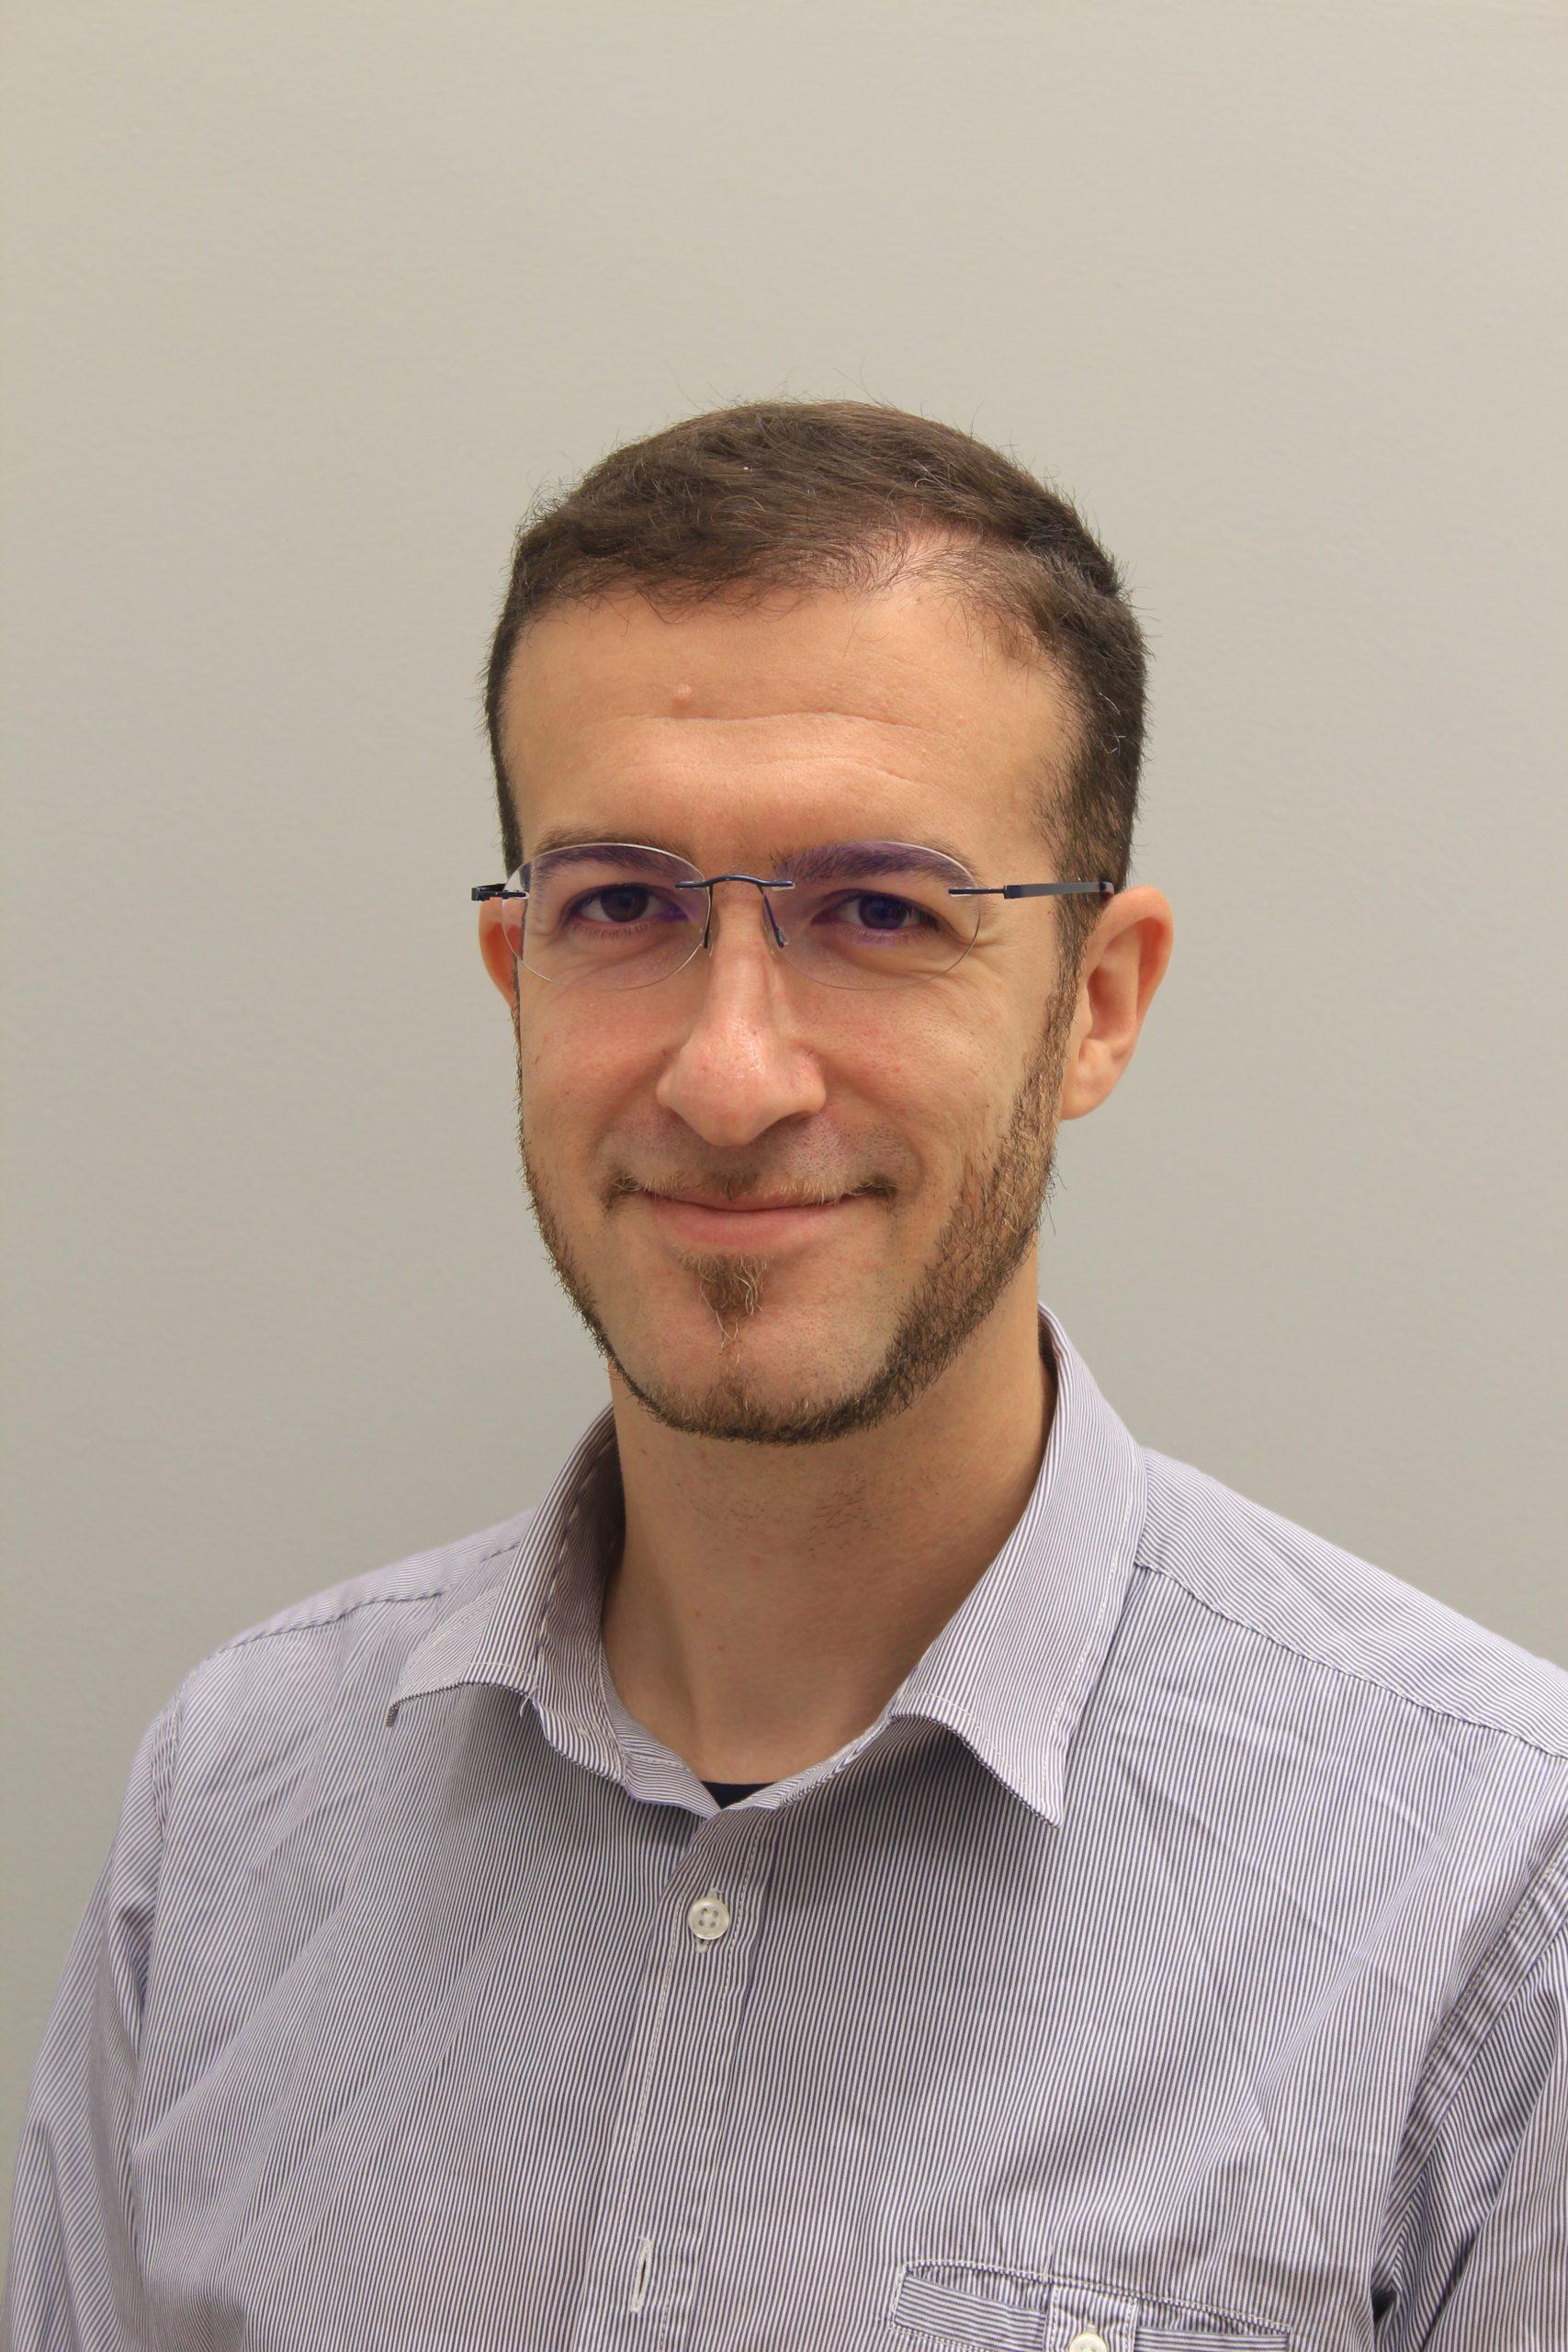 Pierpaolo Busan, PhD